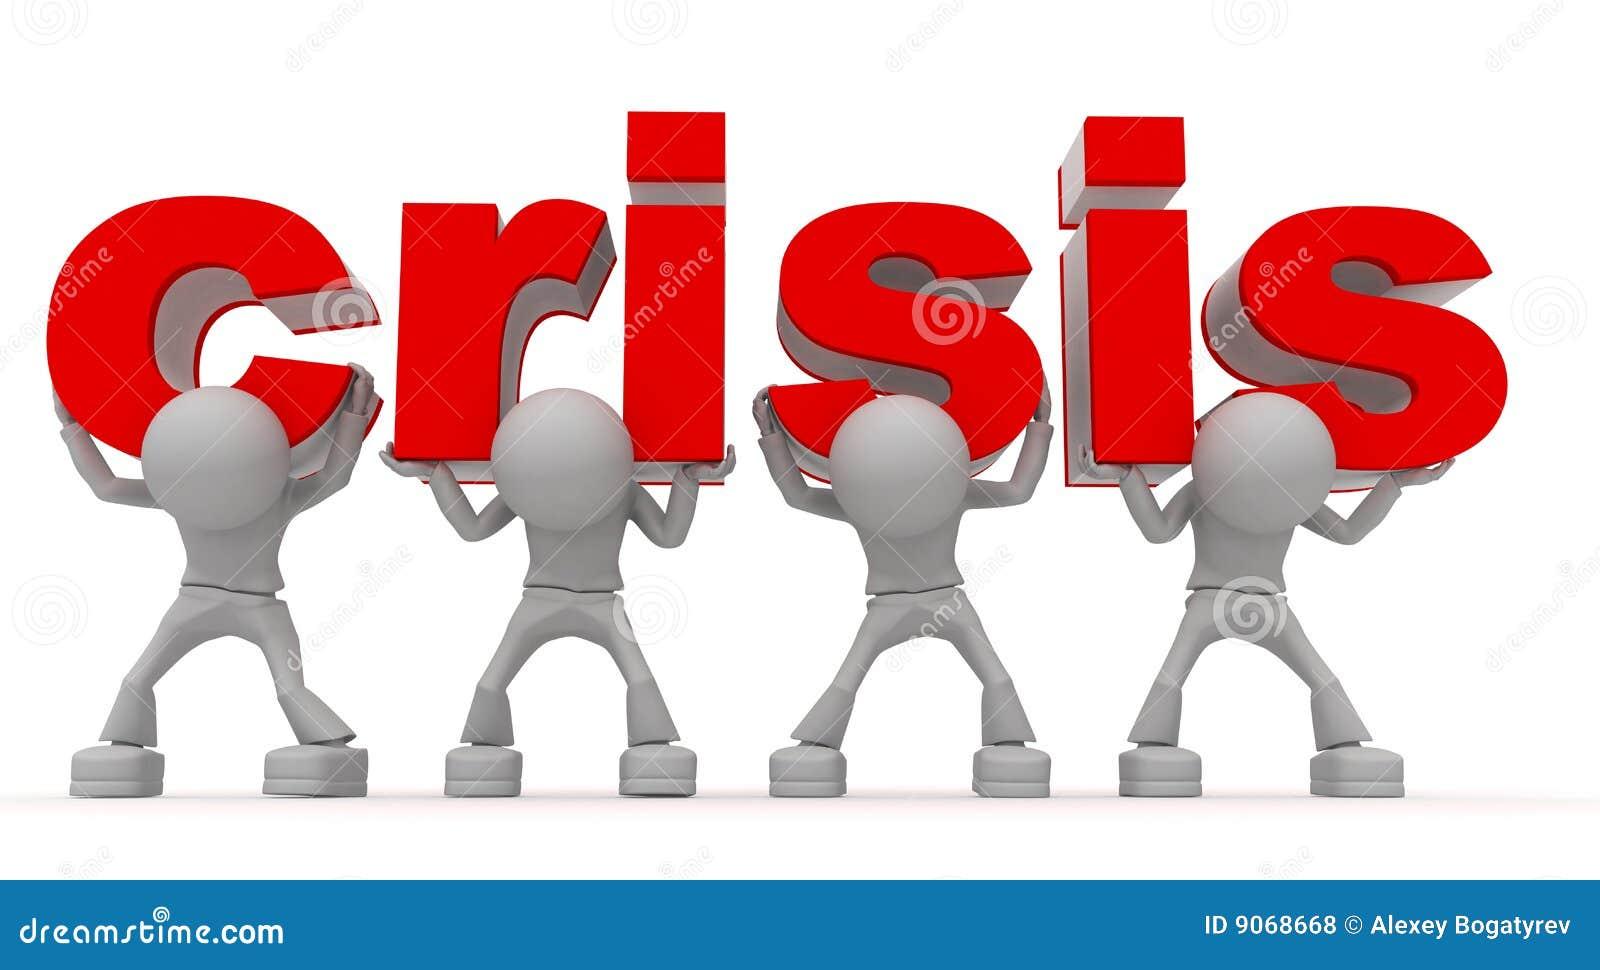 disaster management essays